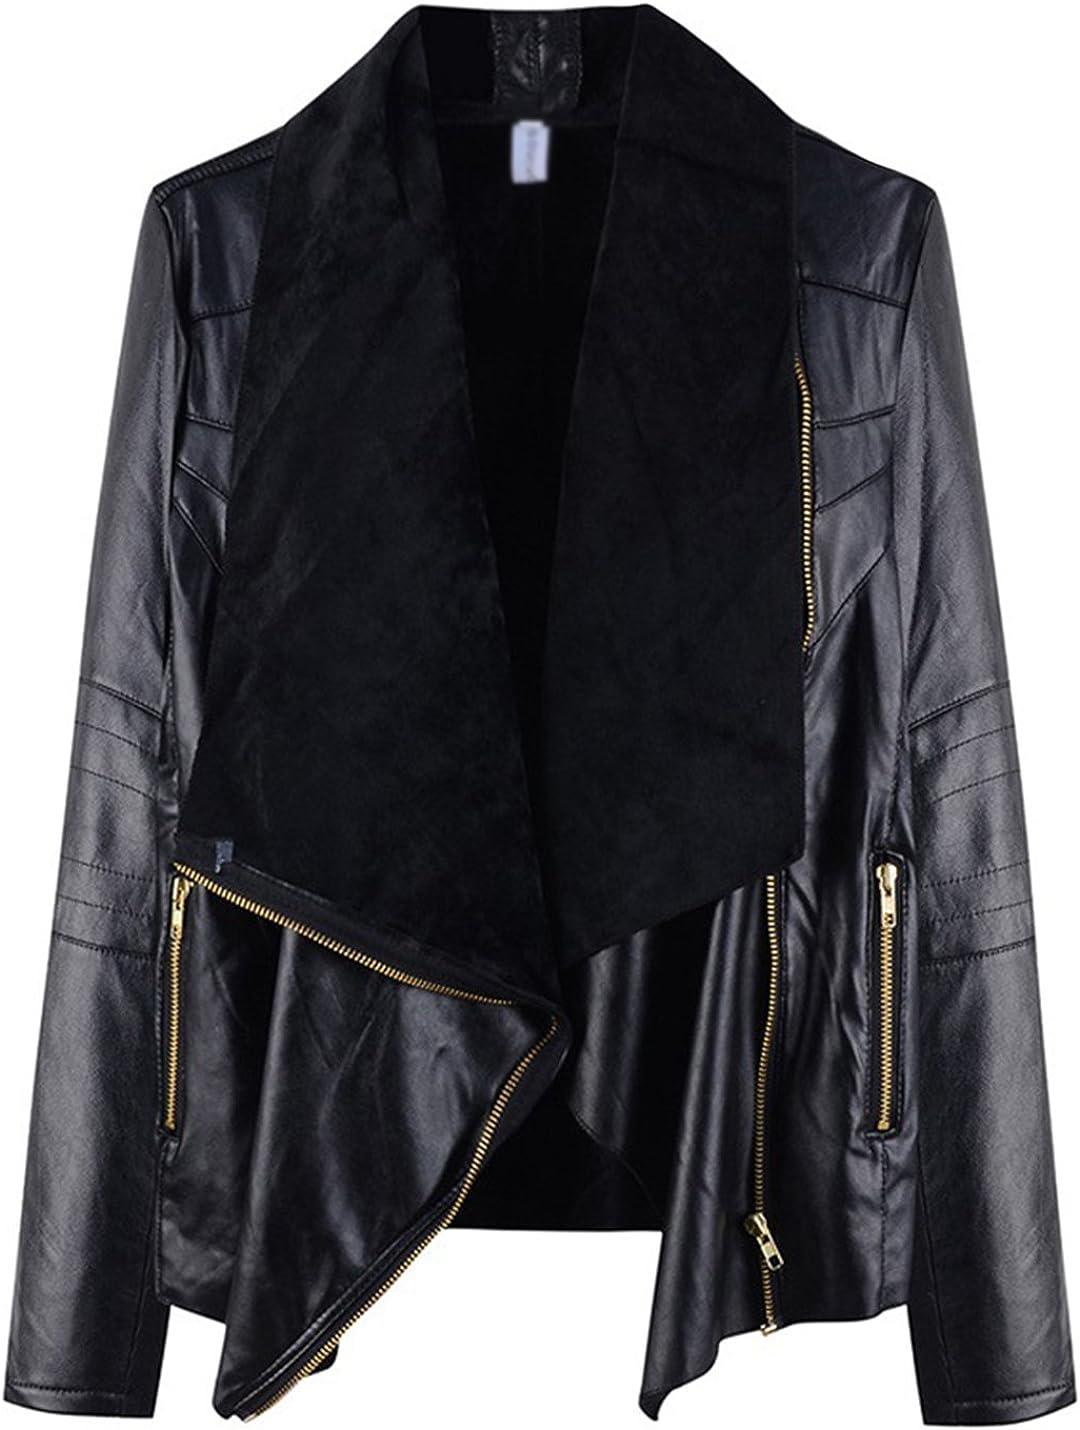 Uaneo Women's Turn Down Collar Zip Up PU Faux Leather Loose Fit Moto Biker Jacket Coat Outwear